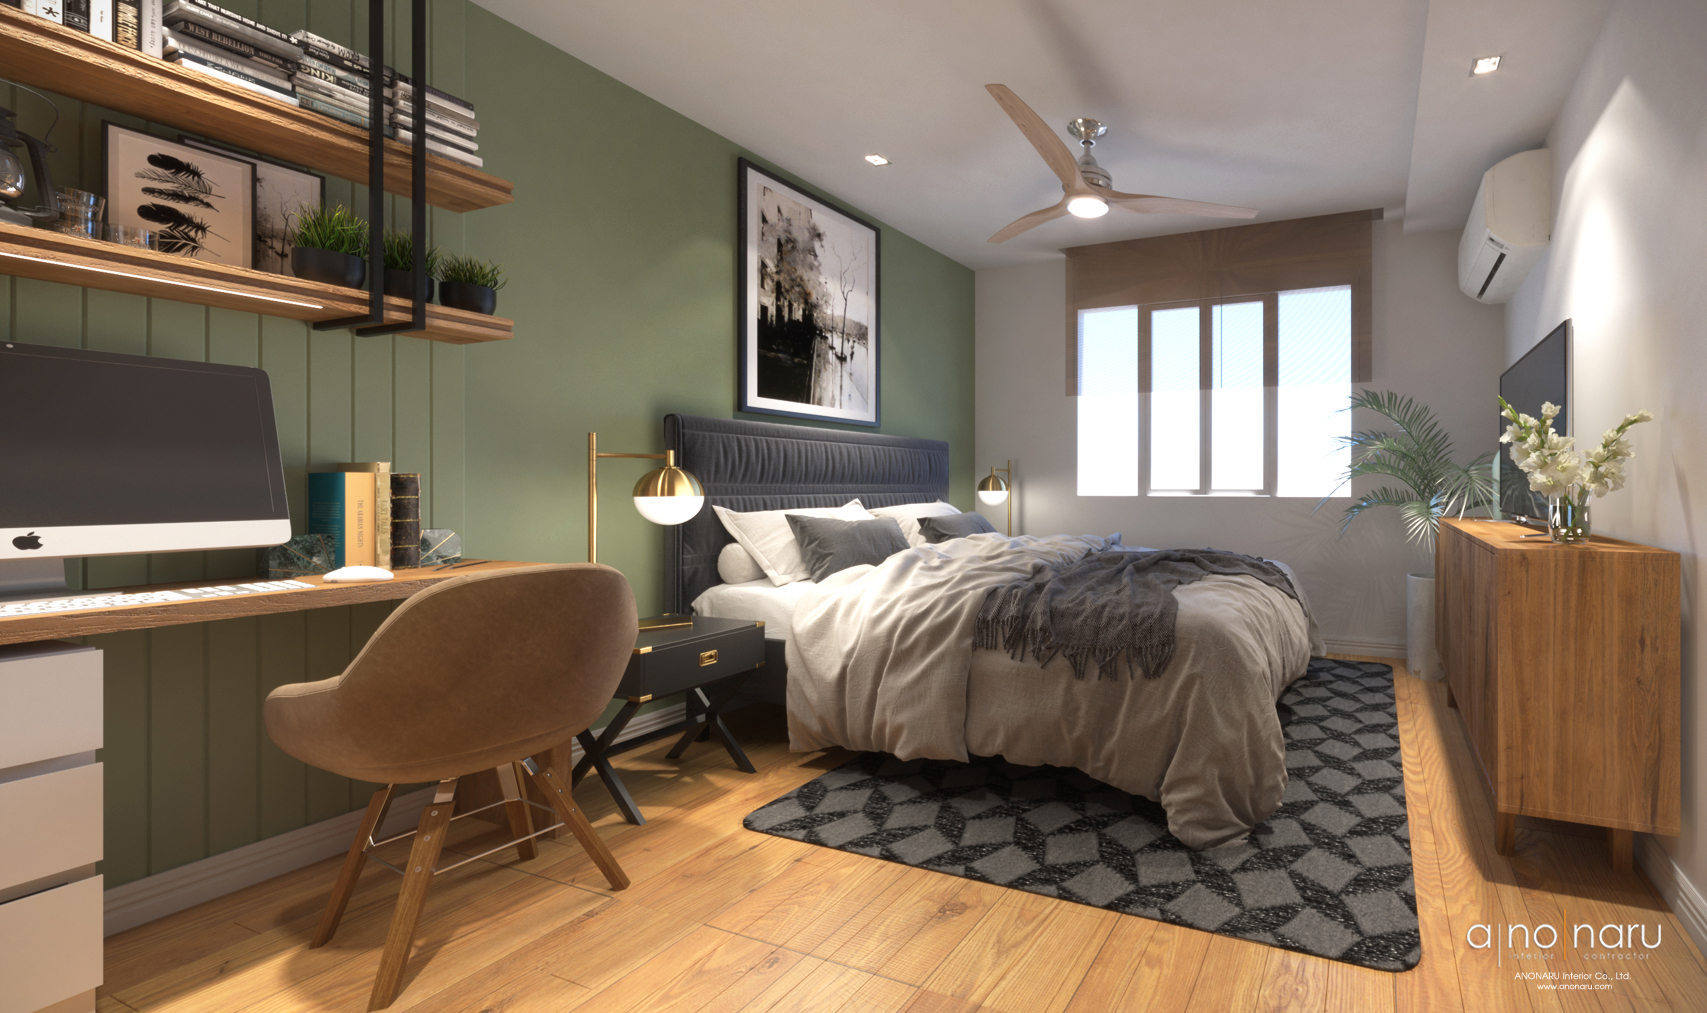 007_MASTER-BEDROOM-A